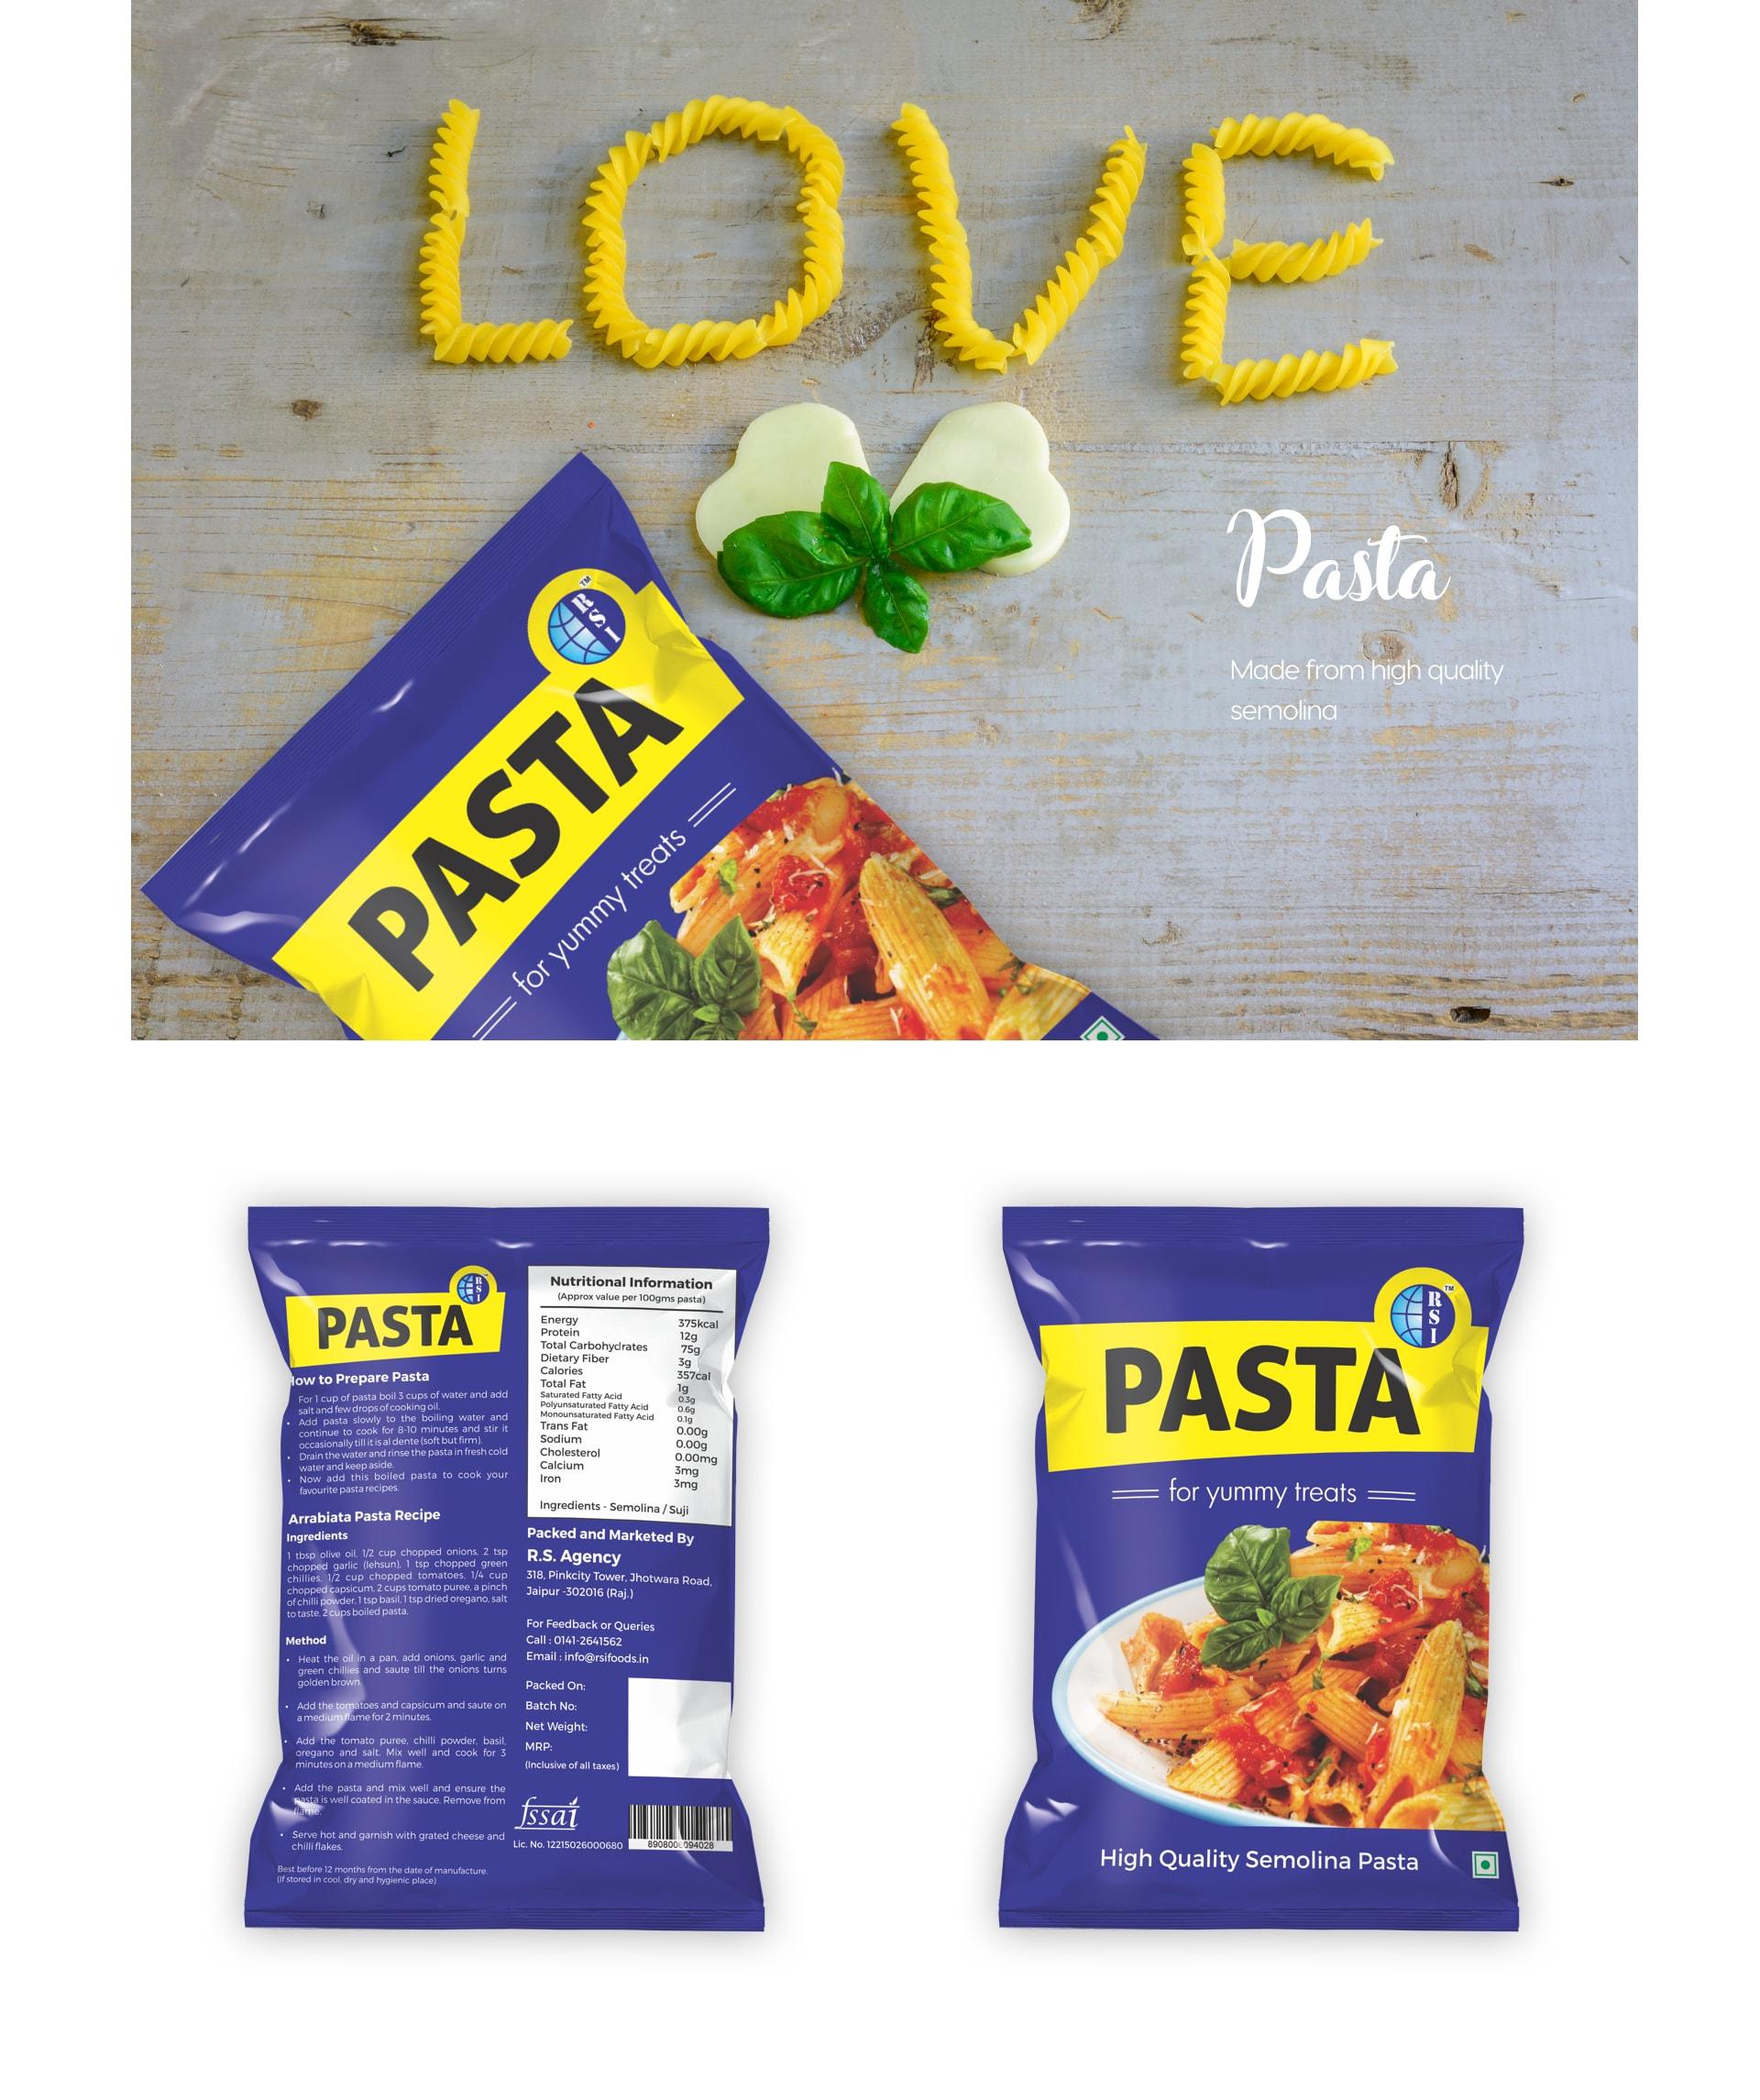 Pasta by R.S. International.